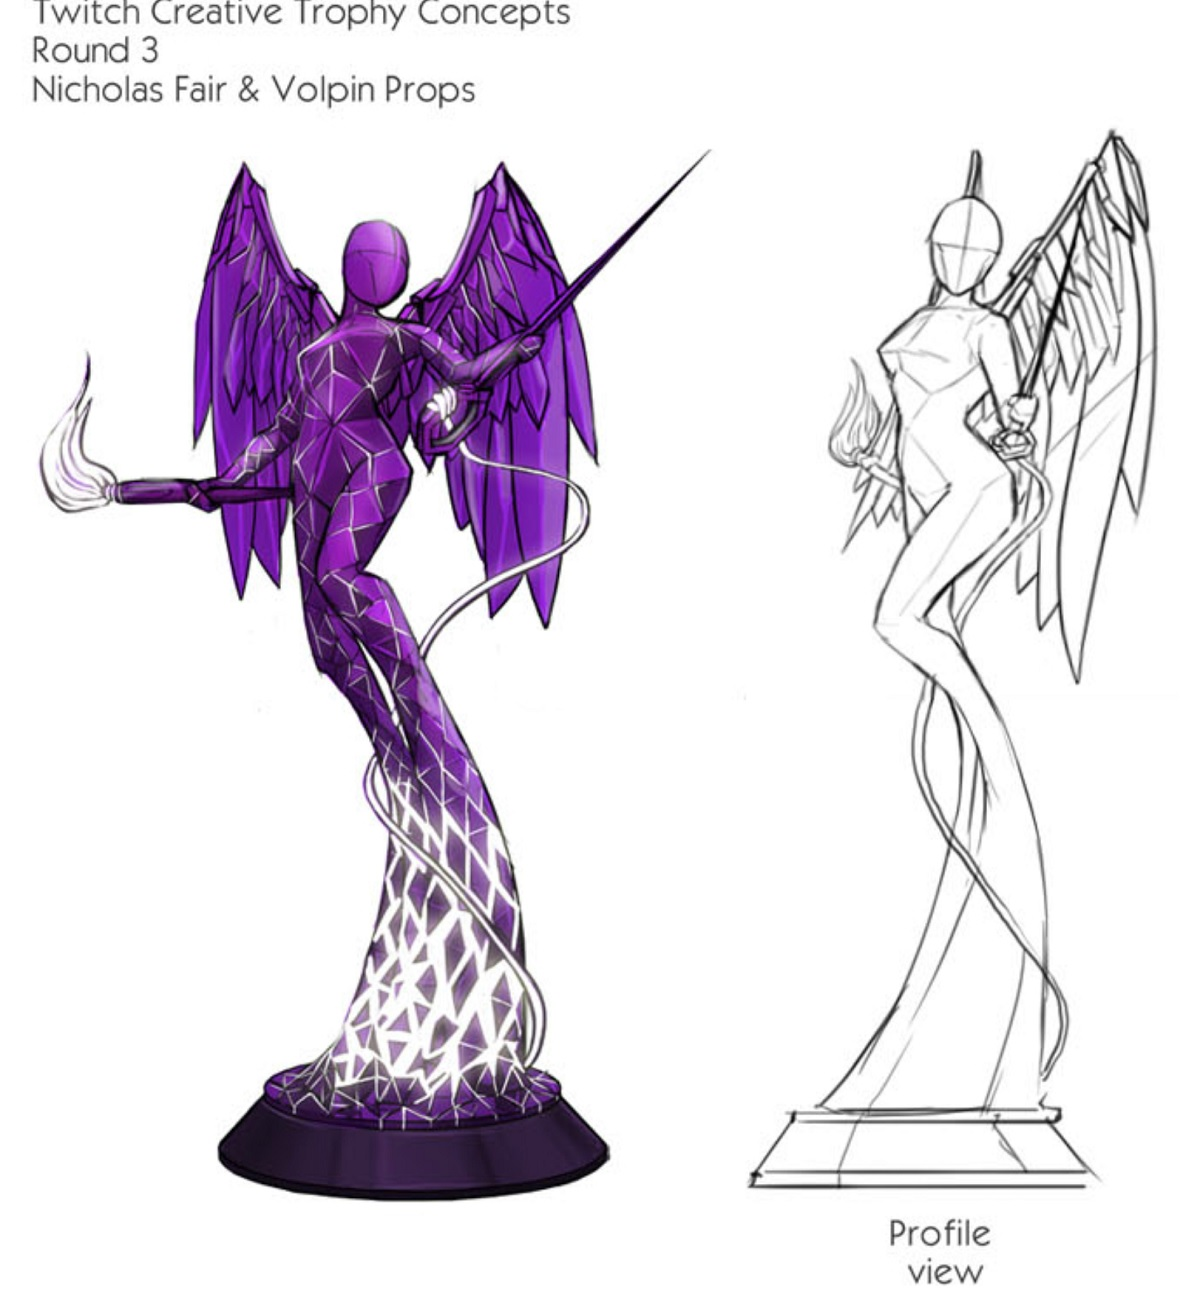 Twitch cosplay prize